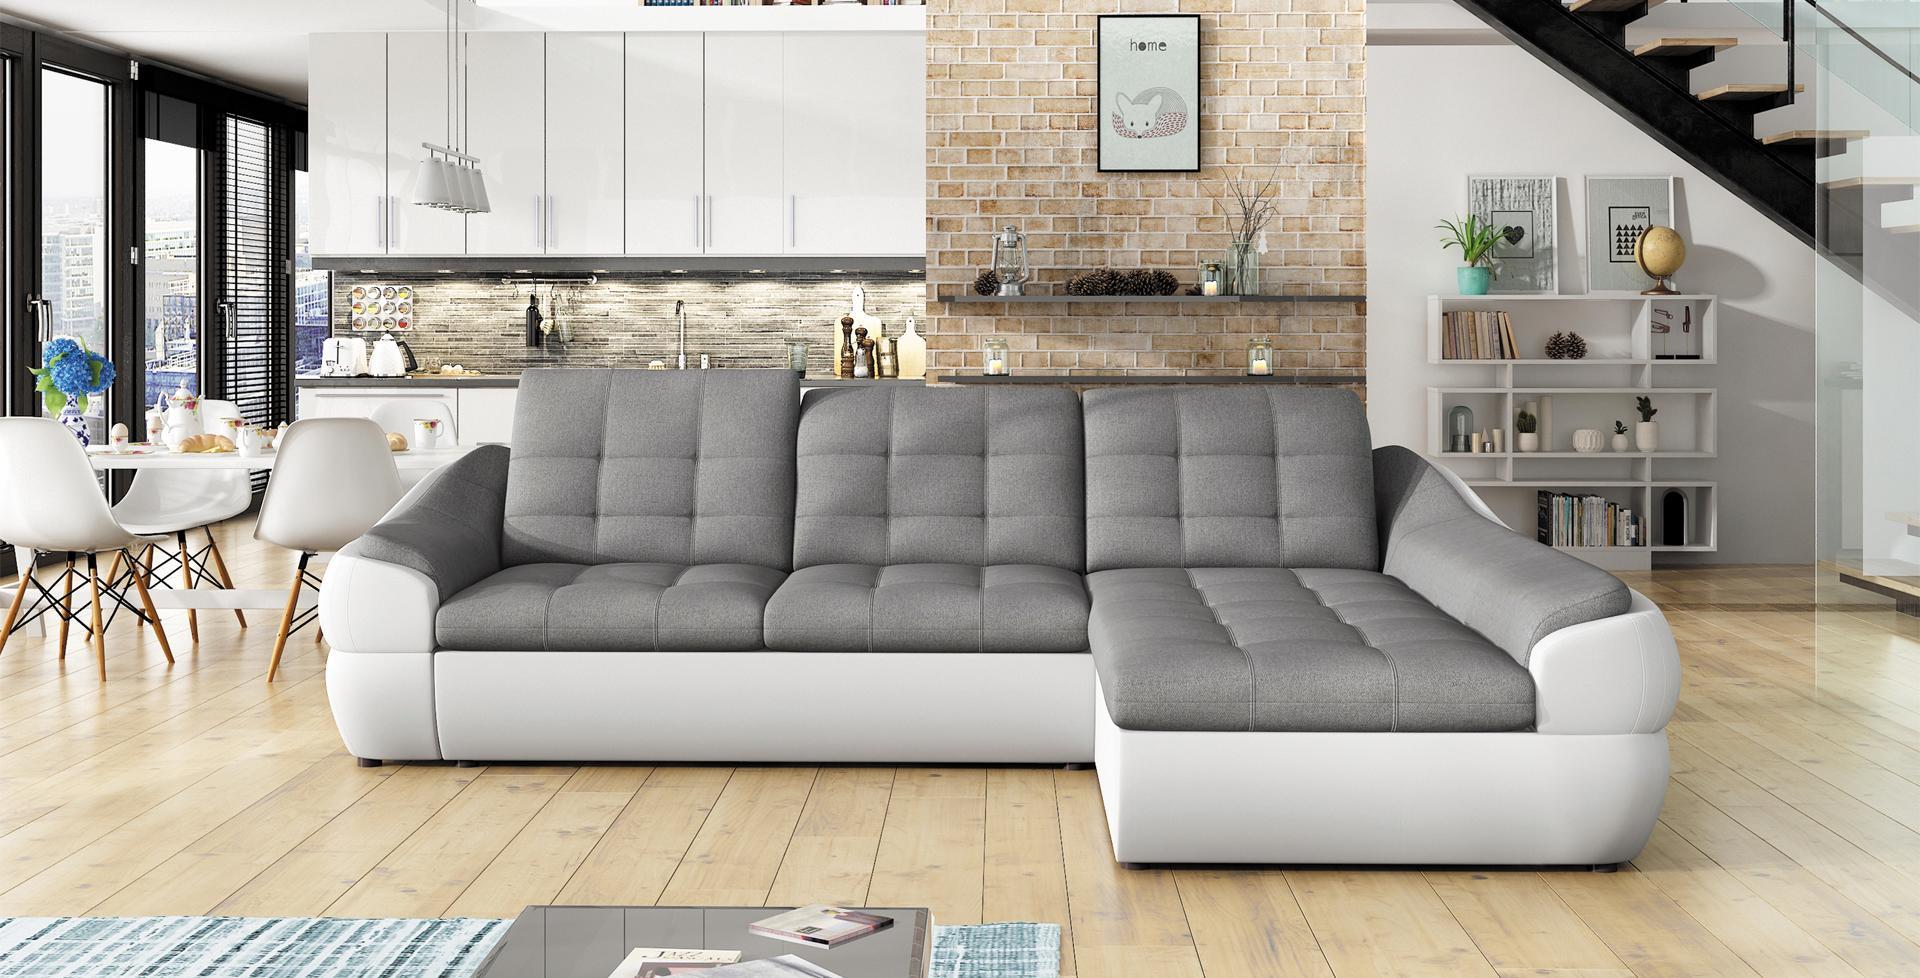 sofa schlafsofa designer sofa mit bettfunktion bettkasten ecksofa couch neu infinity mini. Black Bedroom Furniture Sets. Home Design Ideas